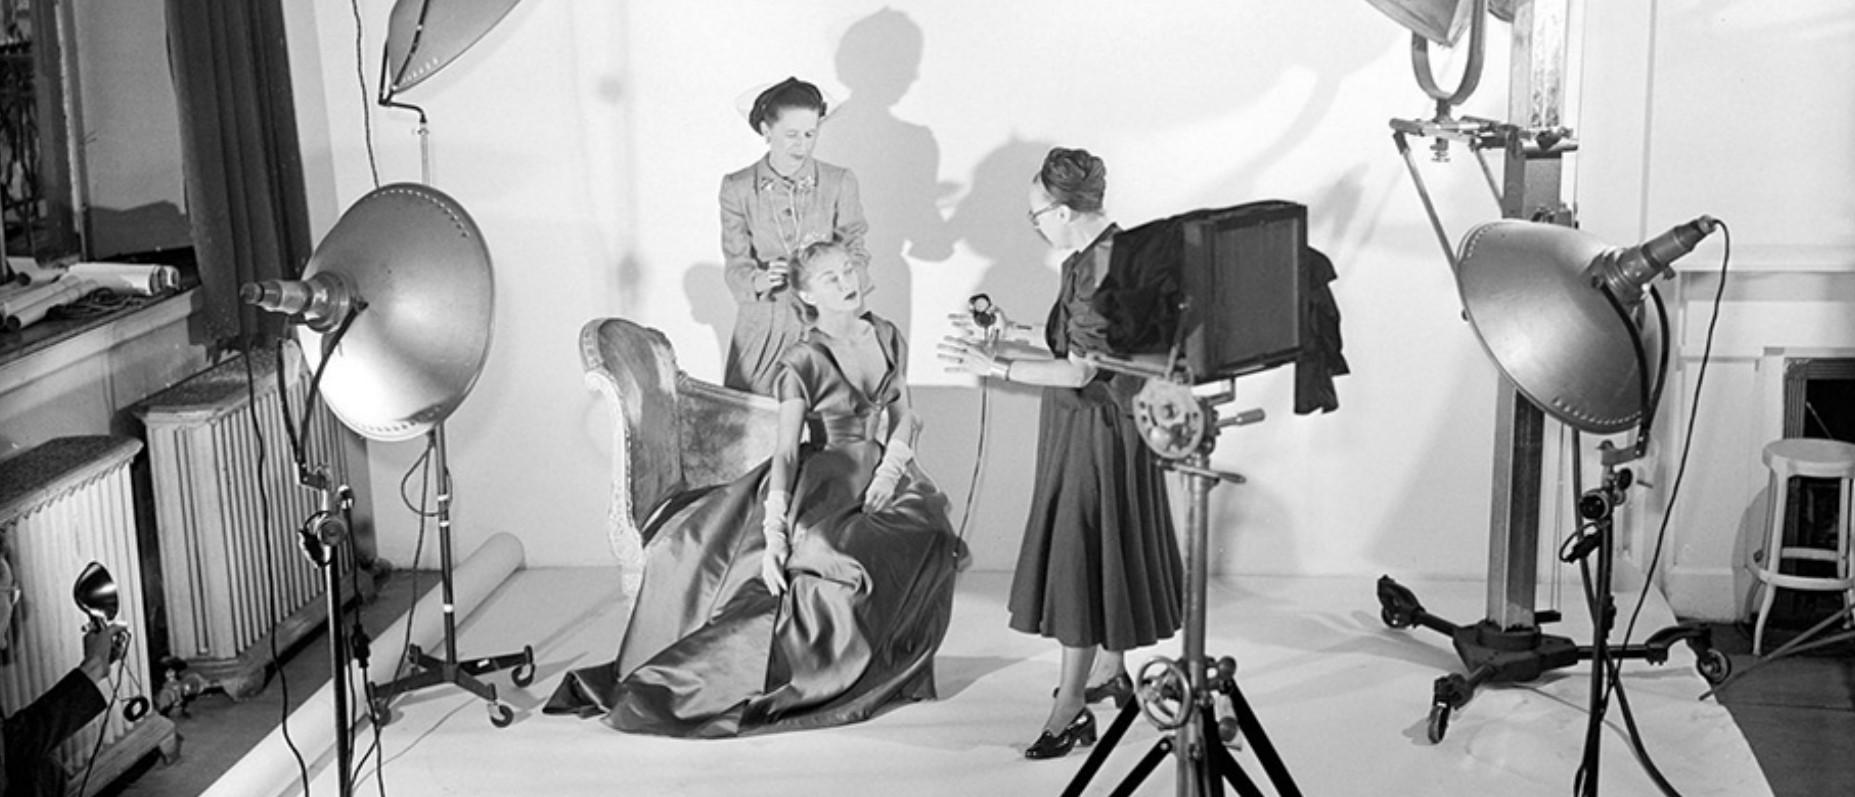 The best of twentieth century fashion photography - Telegraph 82